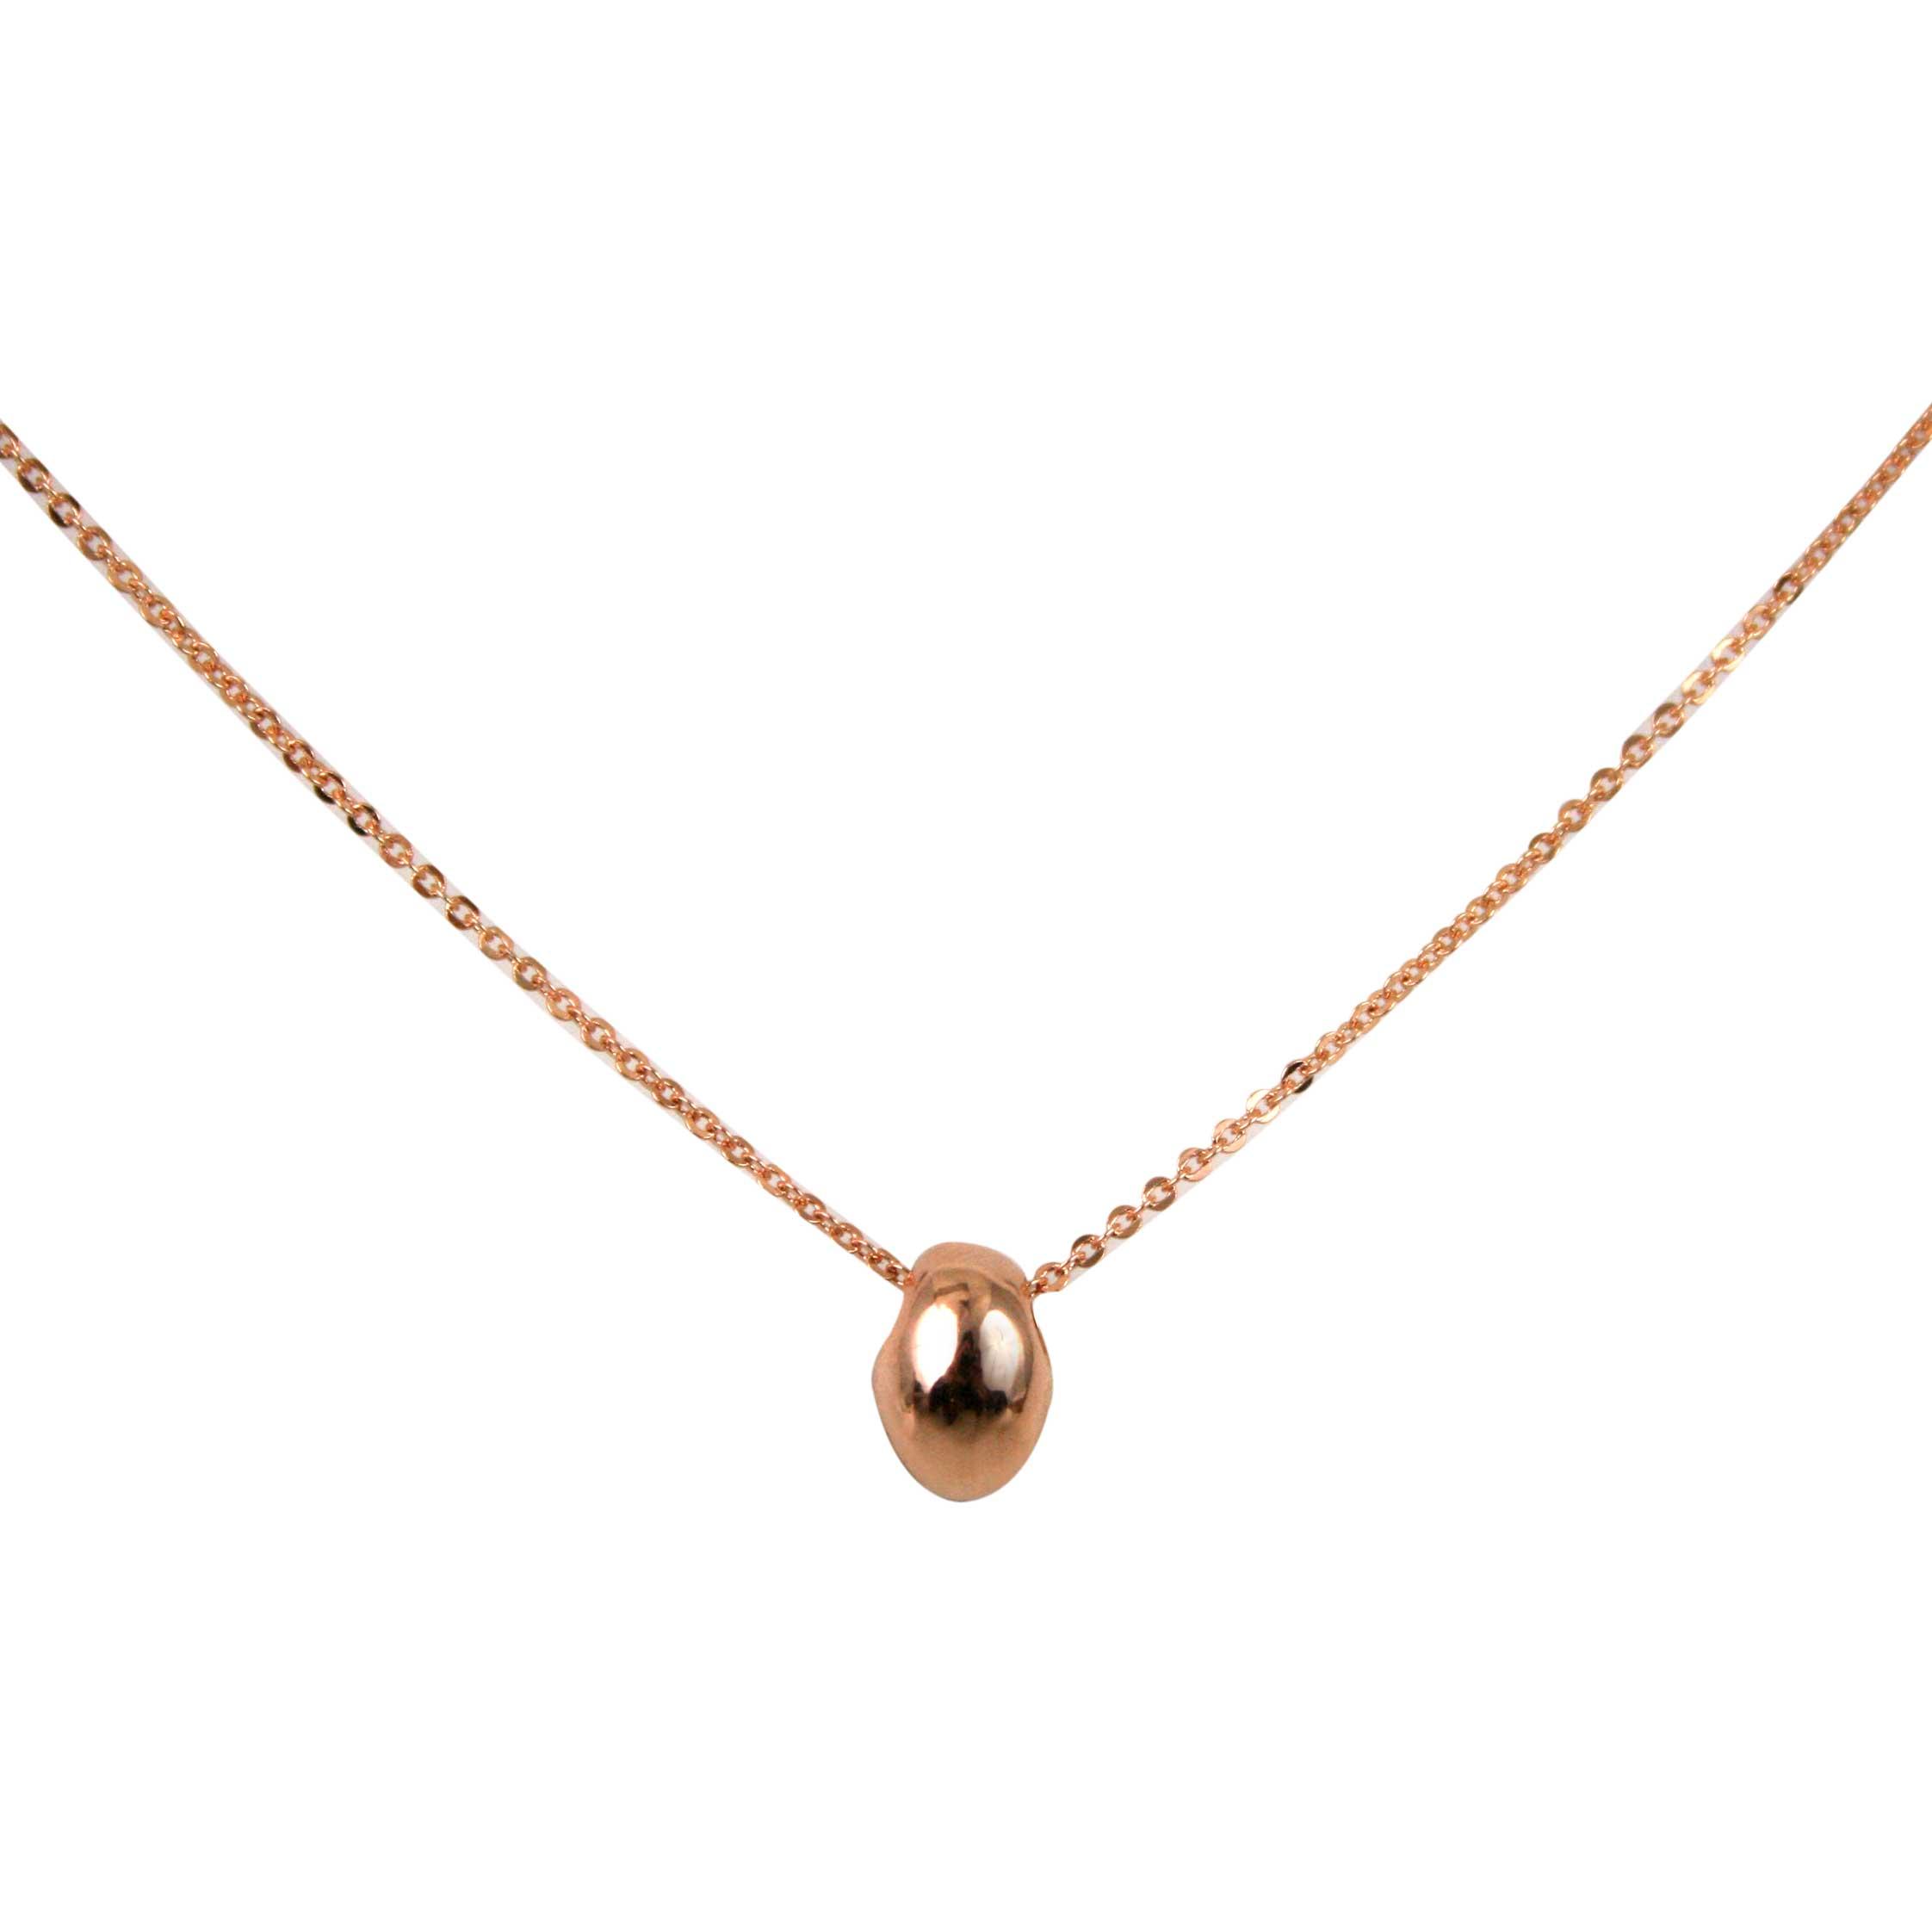 Bella bean pendant